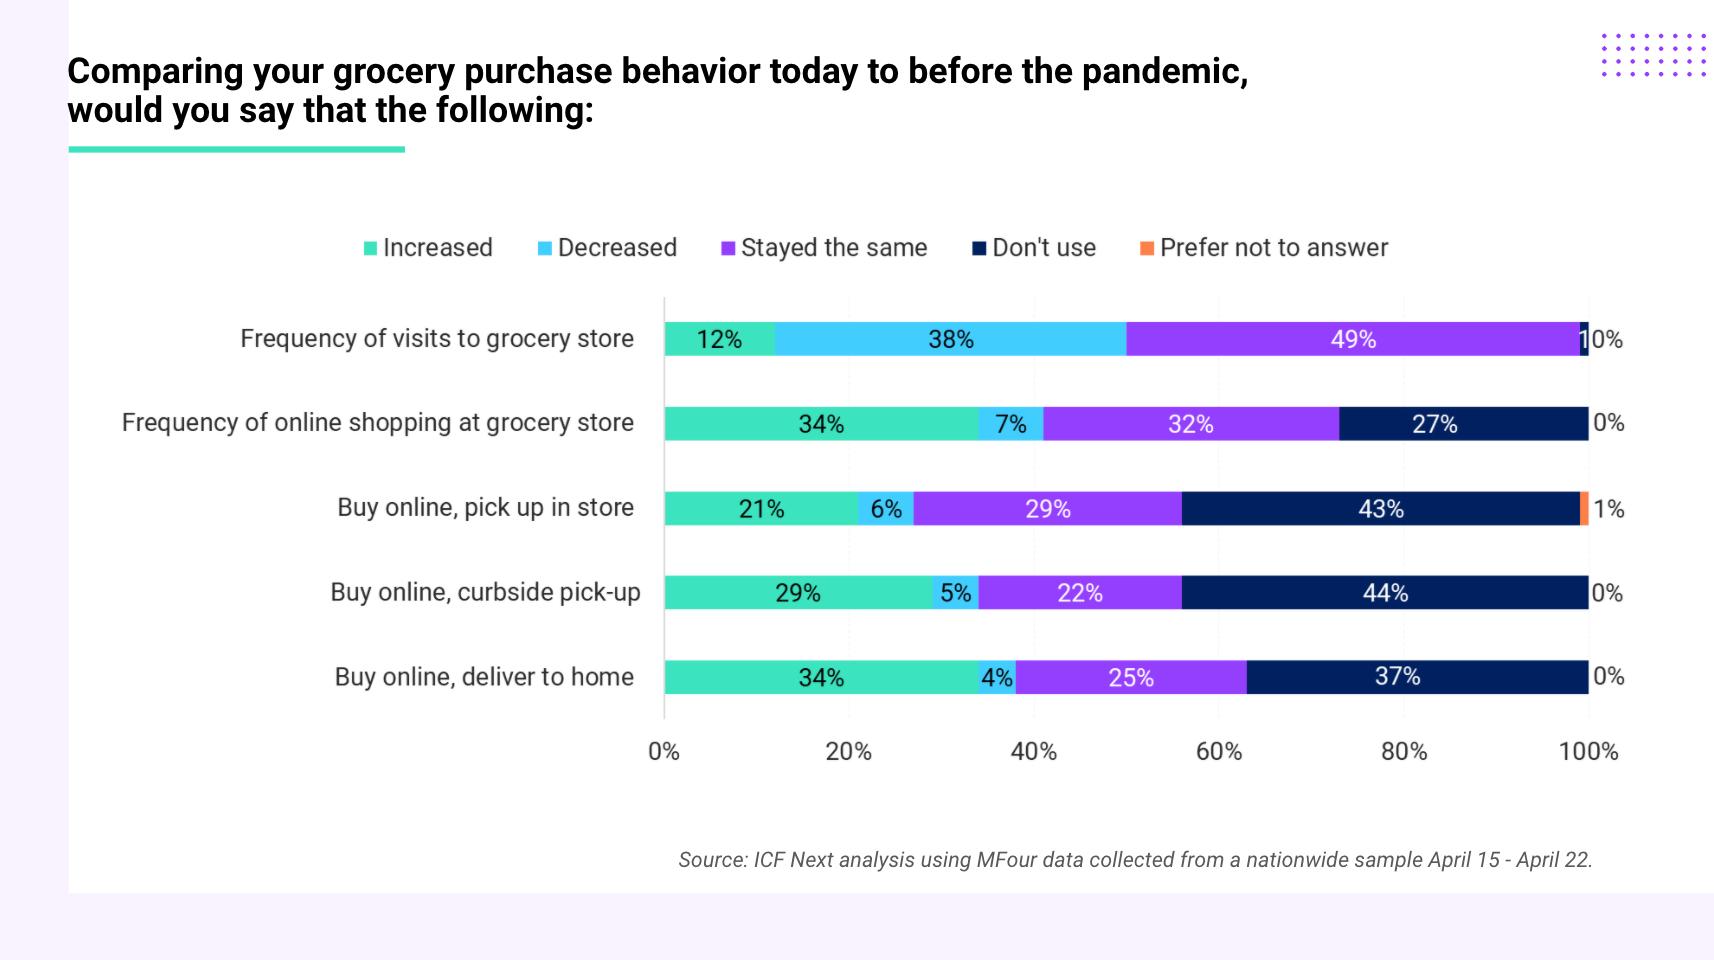 Grocery purchase behavior